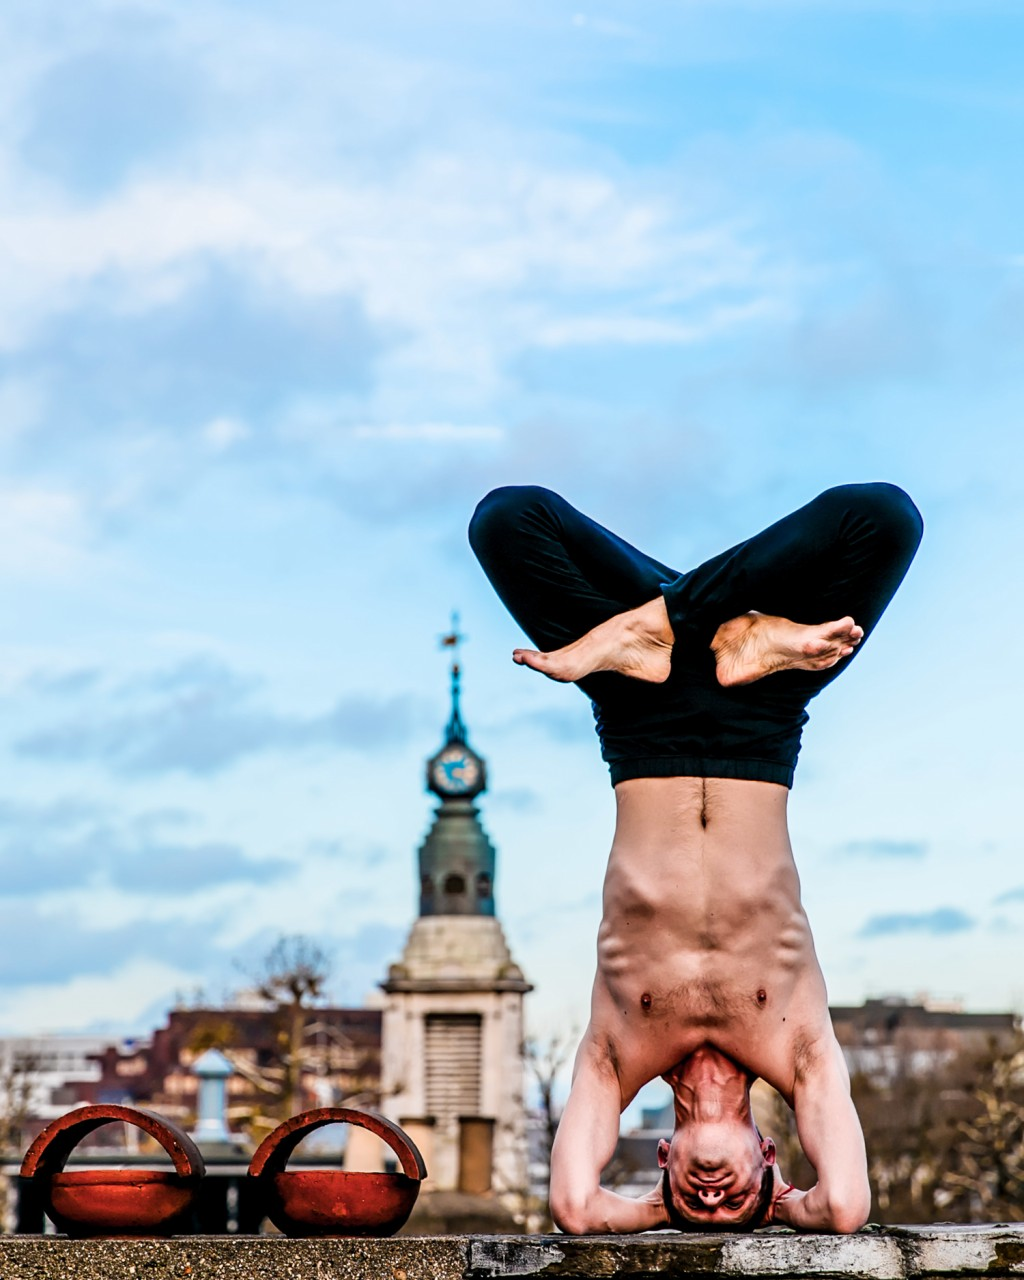 Публично: стриптиз и йога на улицах большого города город